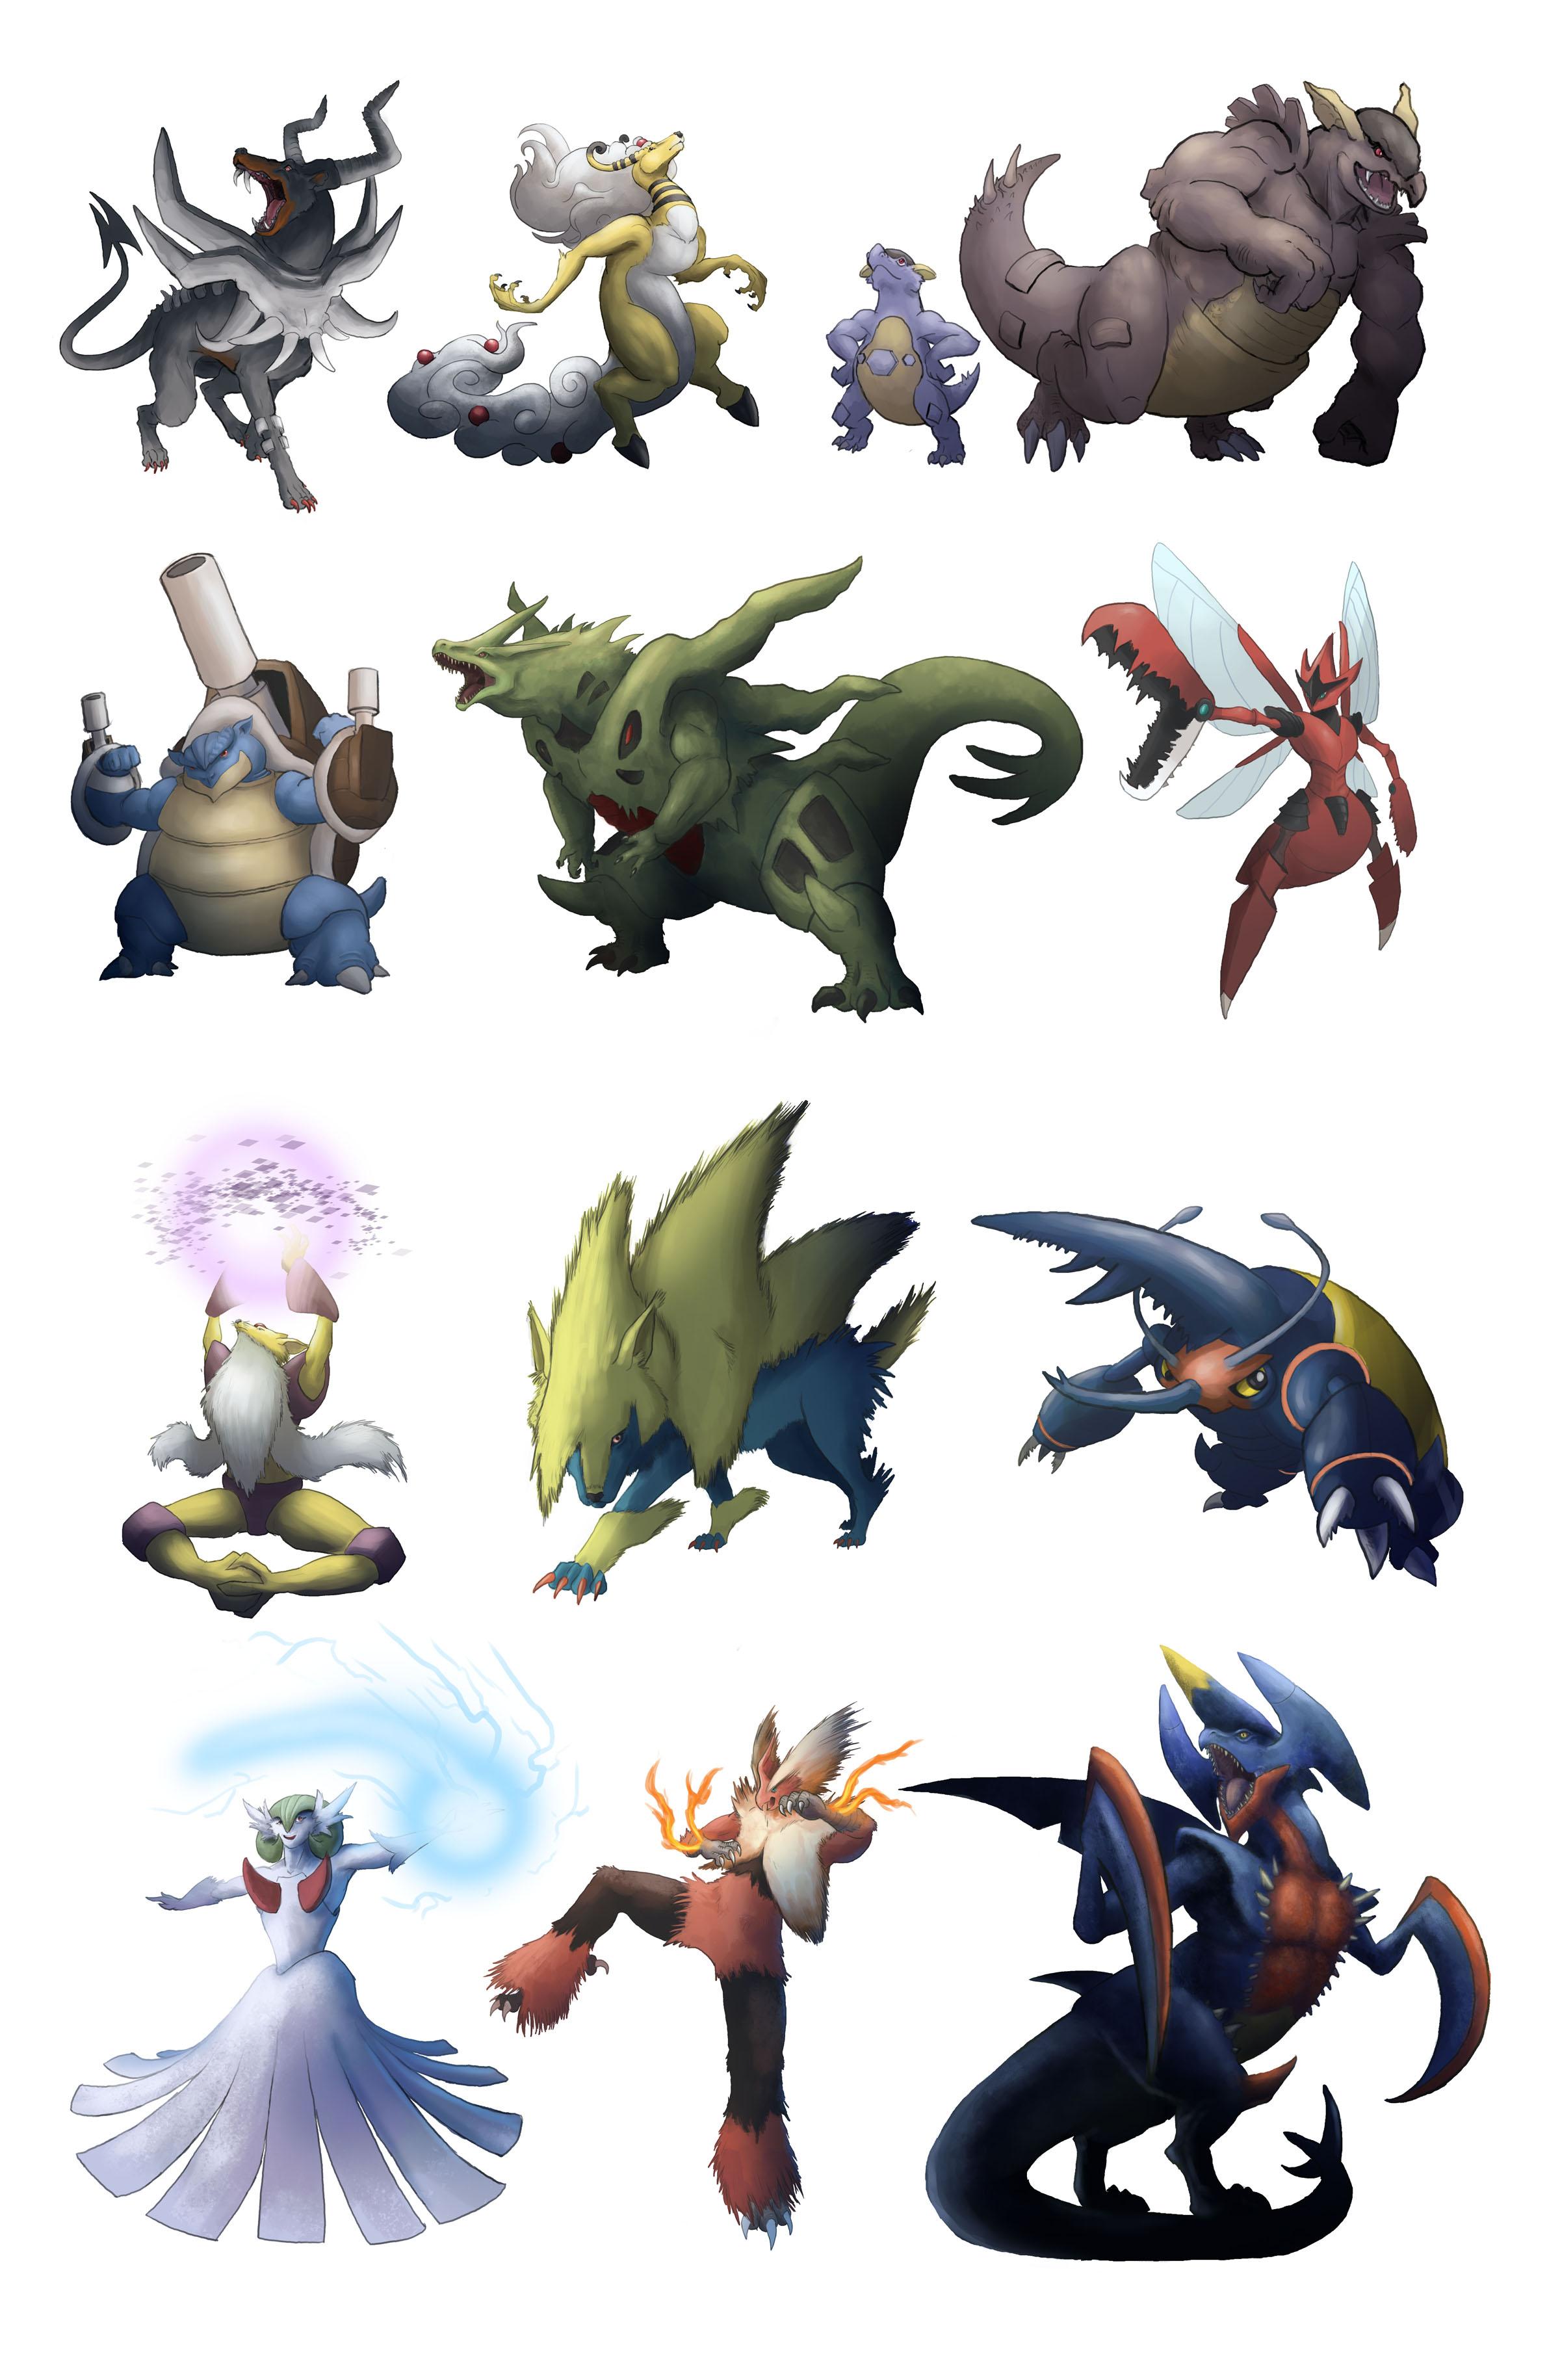 Pokemon by legend13 on deviantart - Mega evoulution ...